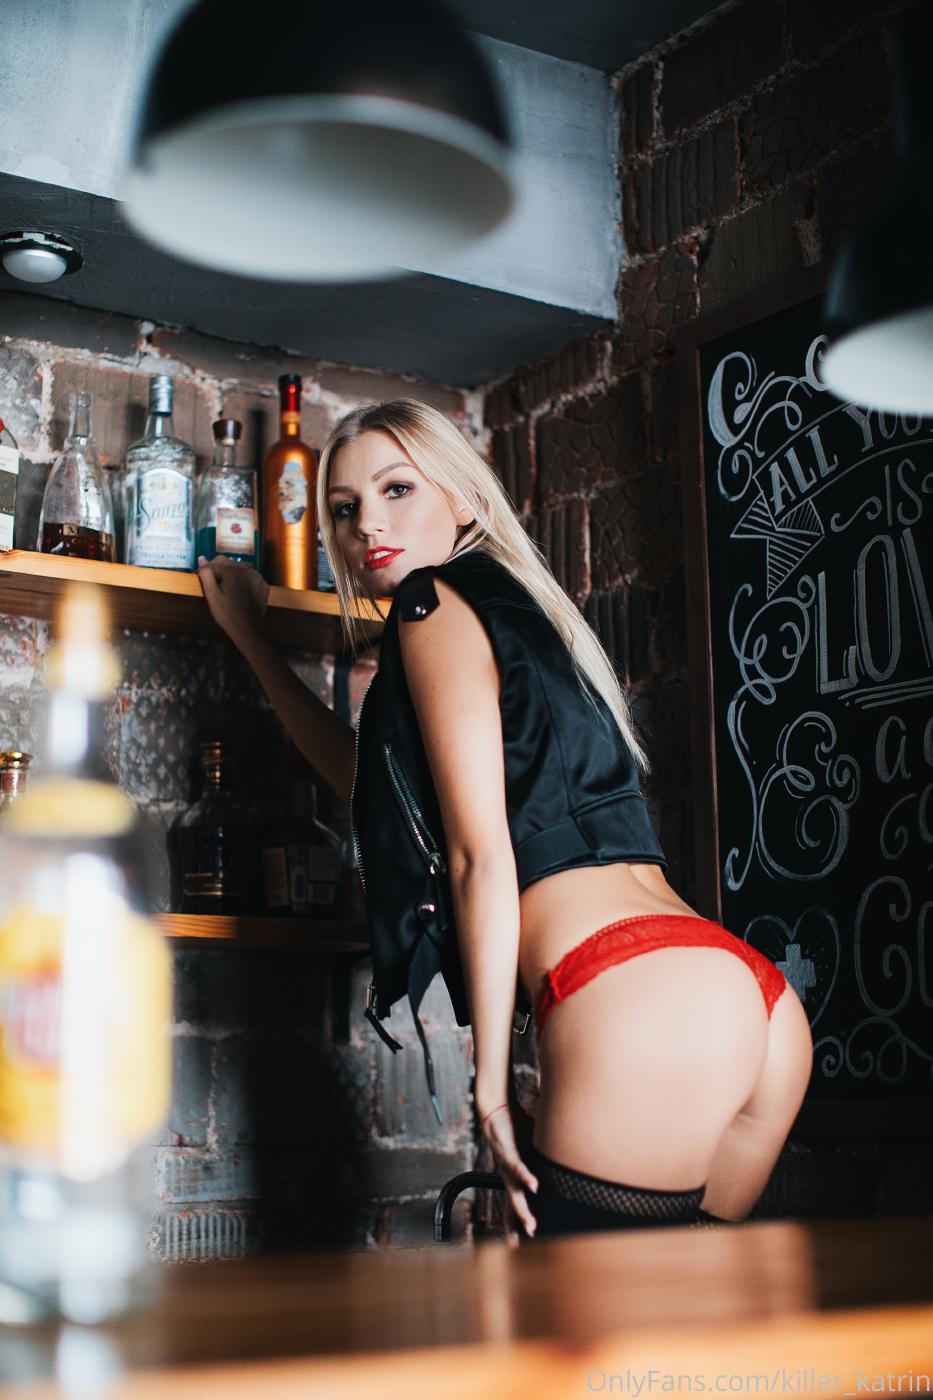 Killer Katrin Bar Striptease Onlyfans Set Leaked 0014